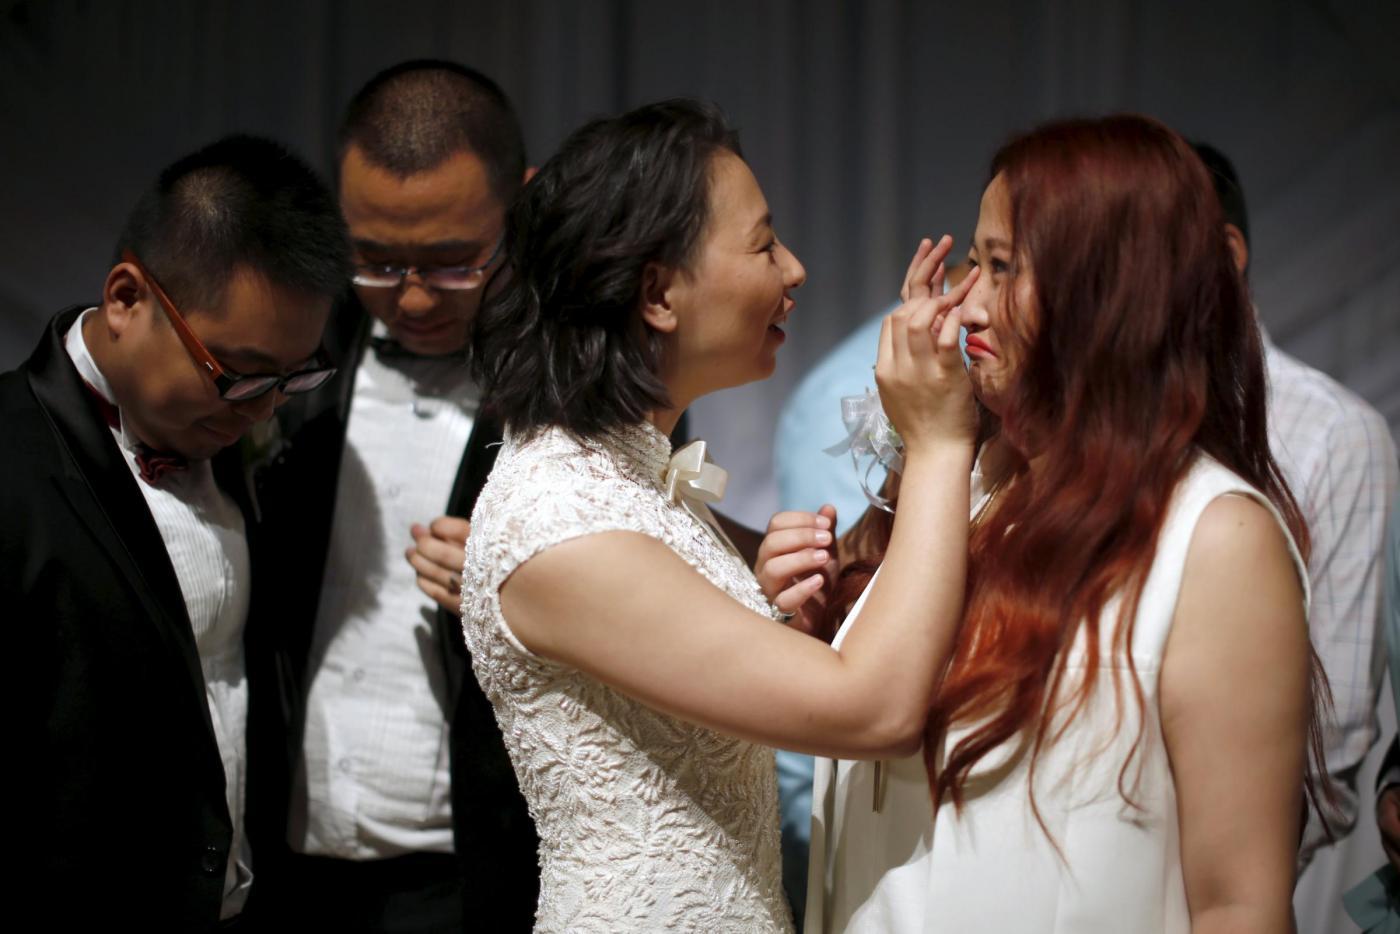 Sette coppie omosessuali cinesi si sposano a Los Angeles15